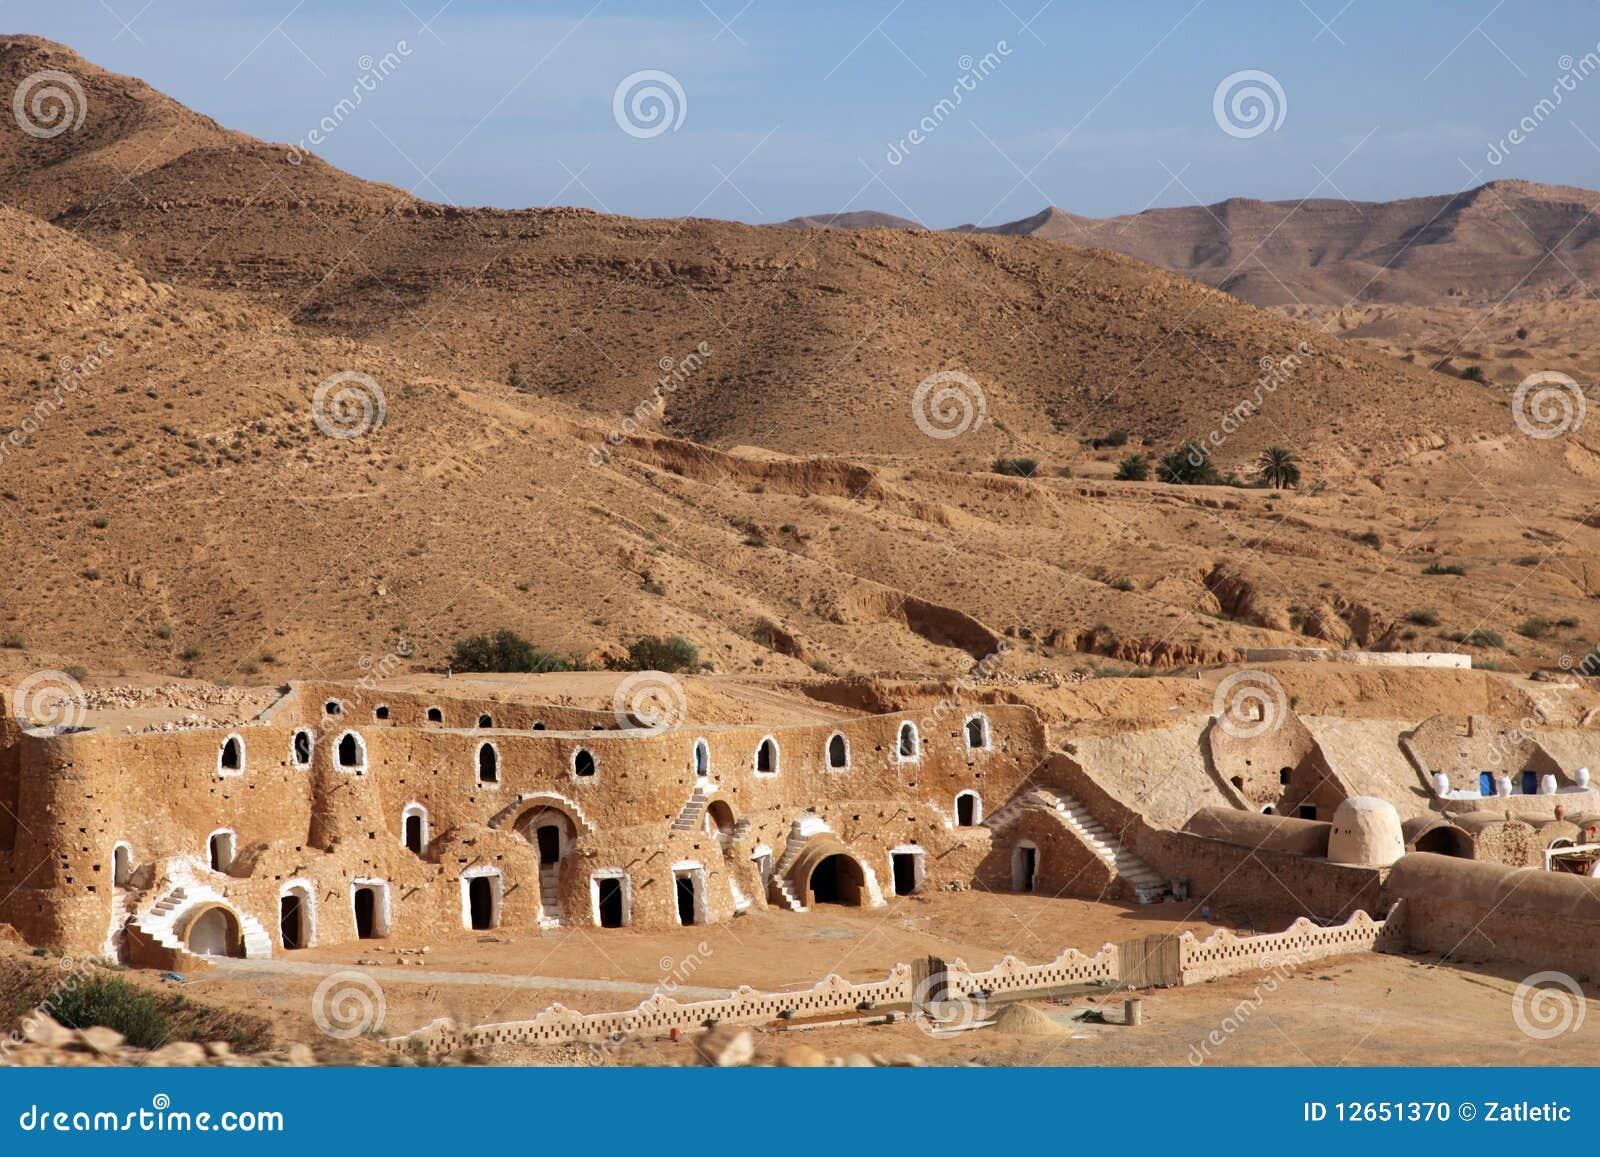 Bedouin House Stock Photo - Image: 12651370